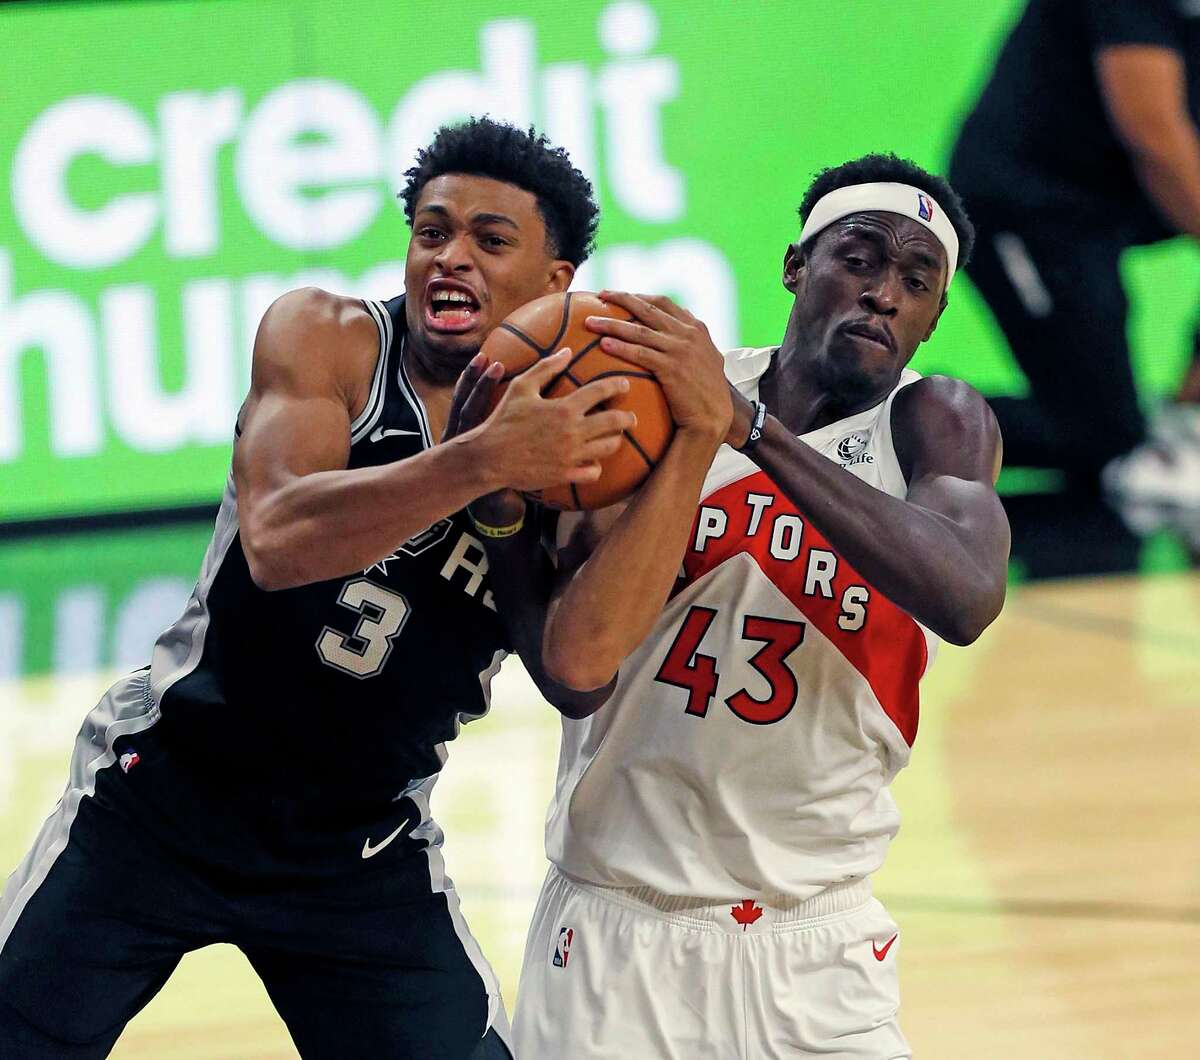 San Antonio Spurs guard Keldon Johnson (3) battles Pascal Siakam #43 of the Toronto Raptors for a rebound. Spurs v Raptors at AT&T Center on Saturday, Dec. 26, 2020.